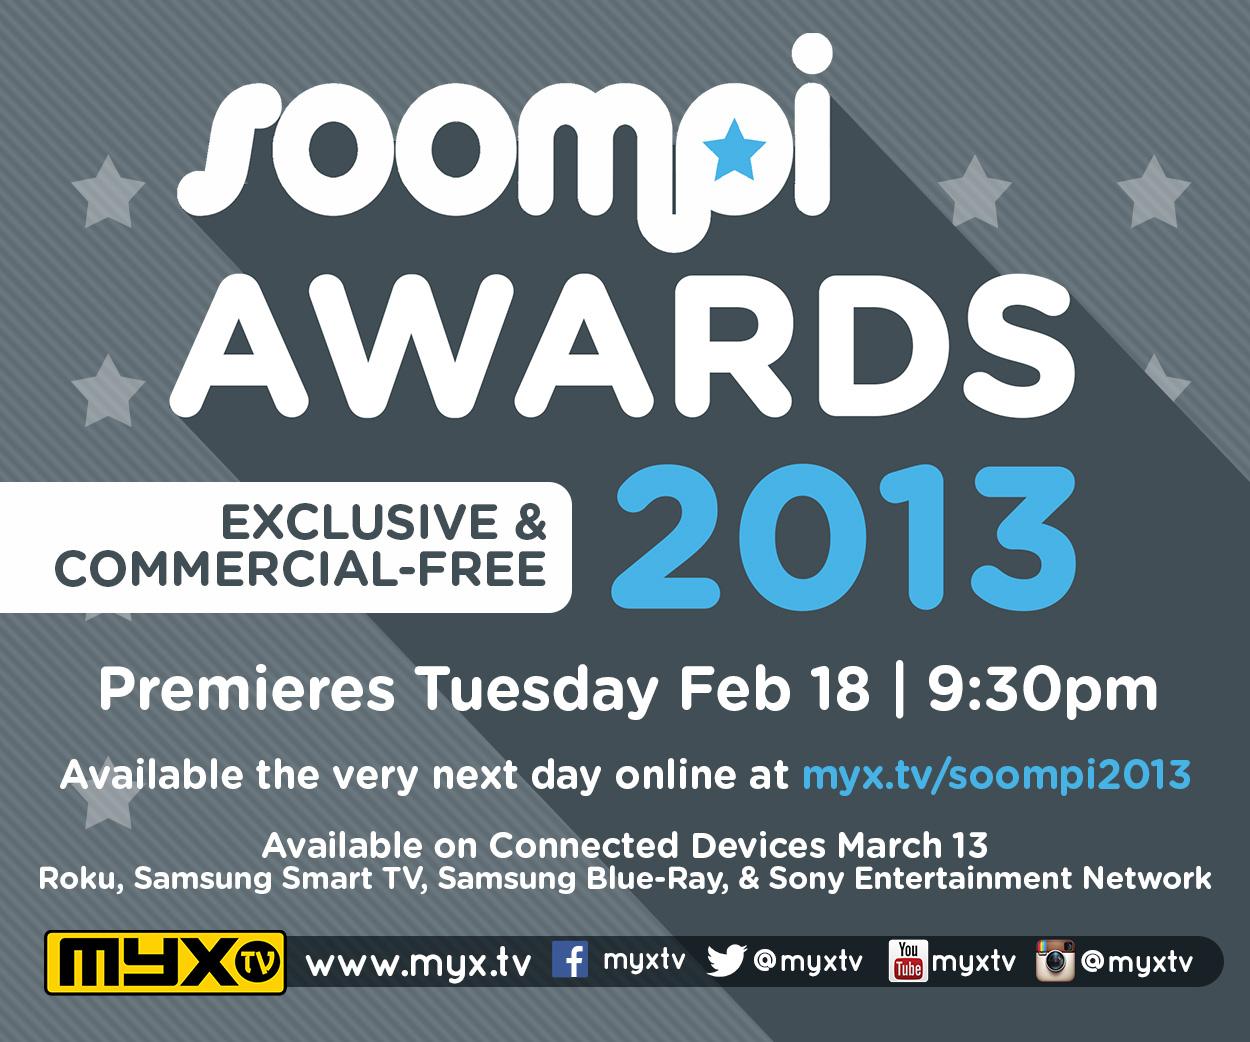 Myx TV - Soompi Awards 2013